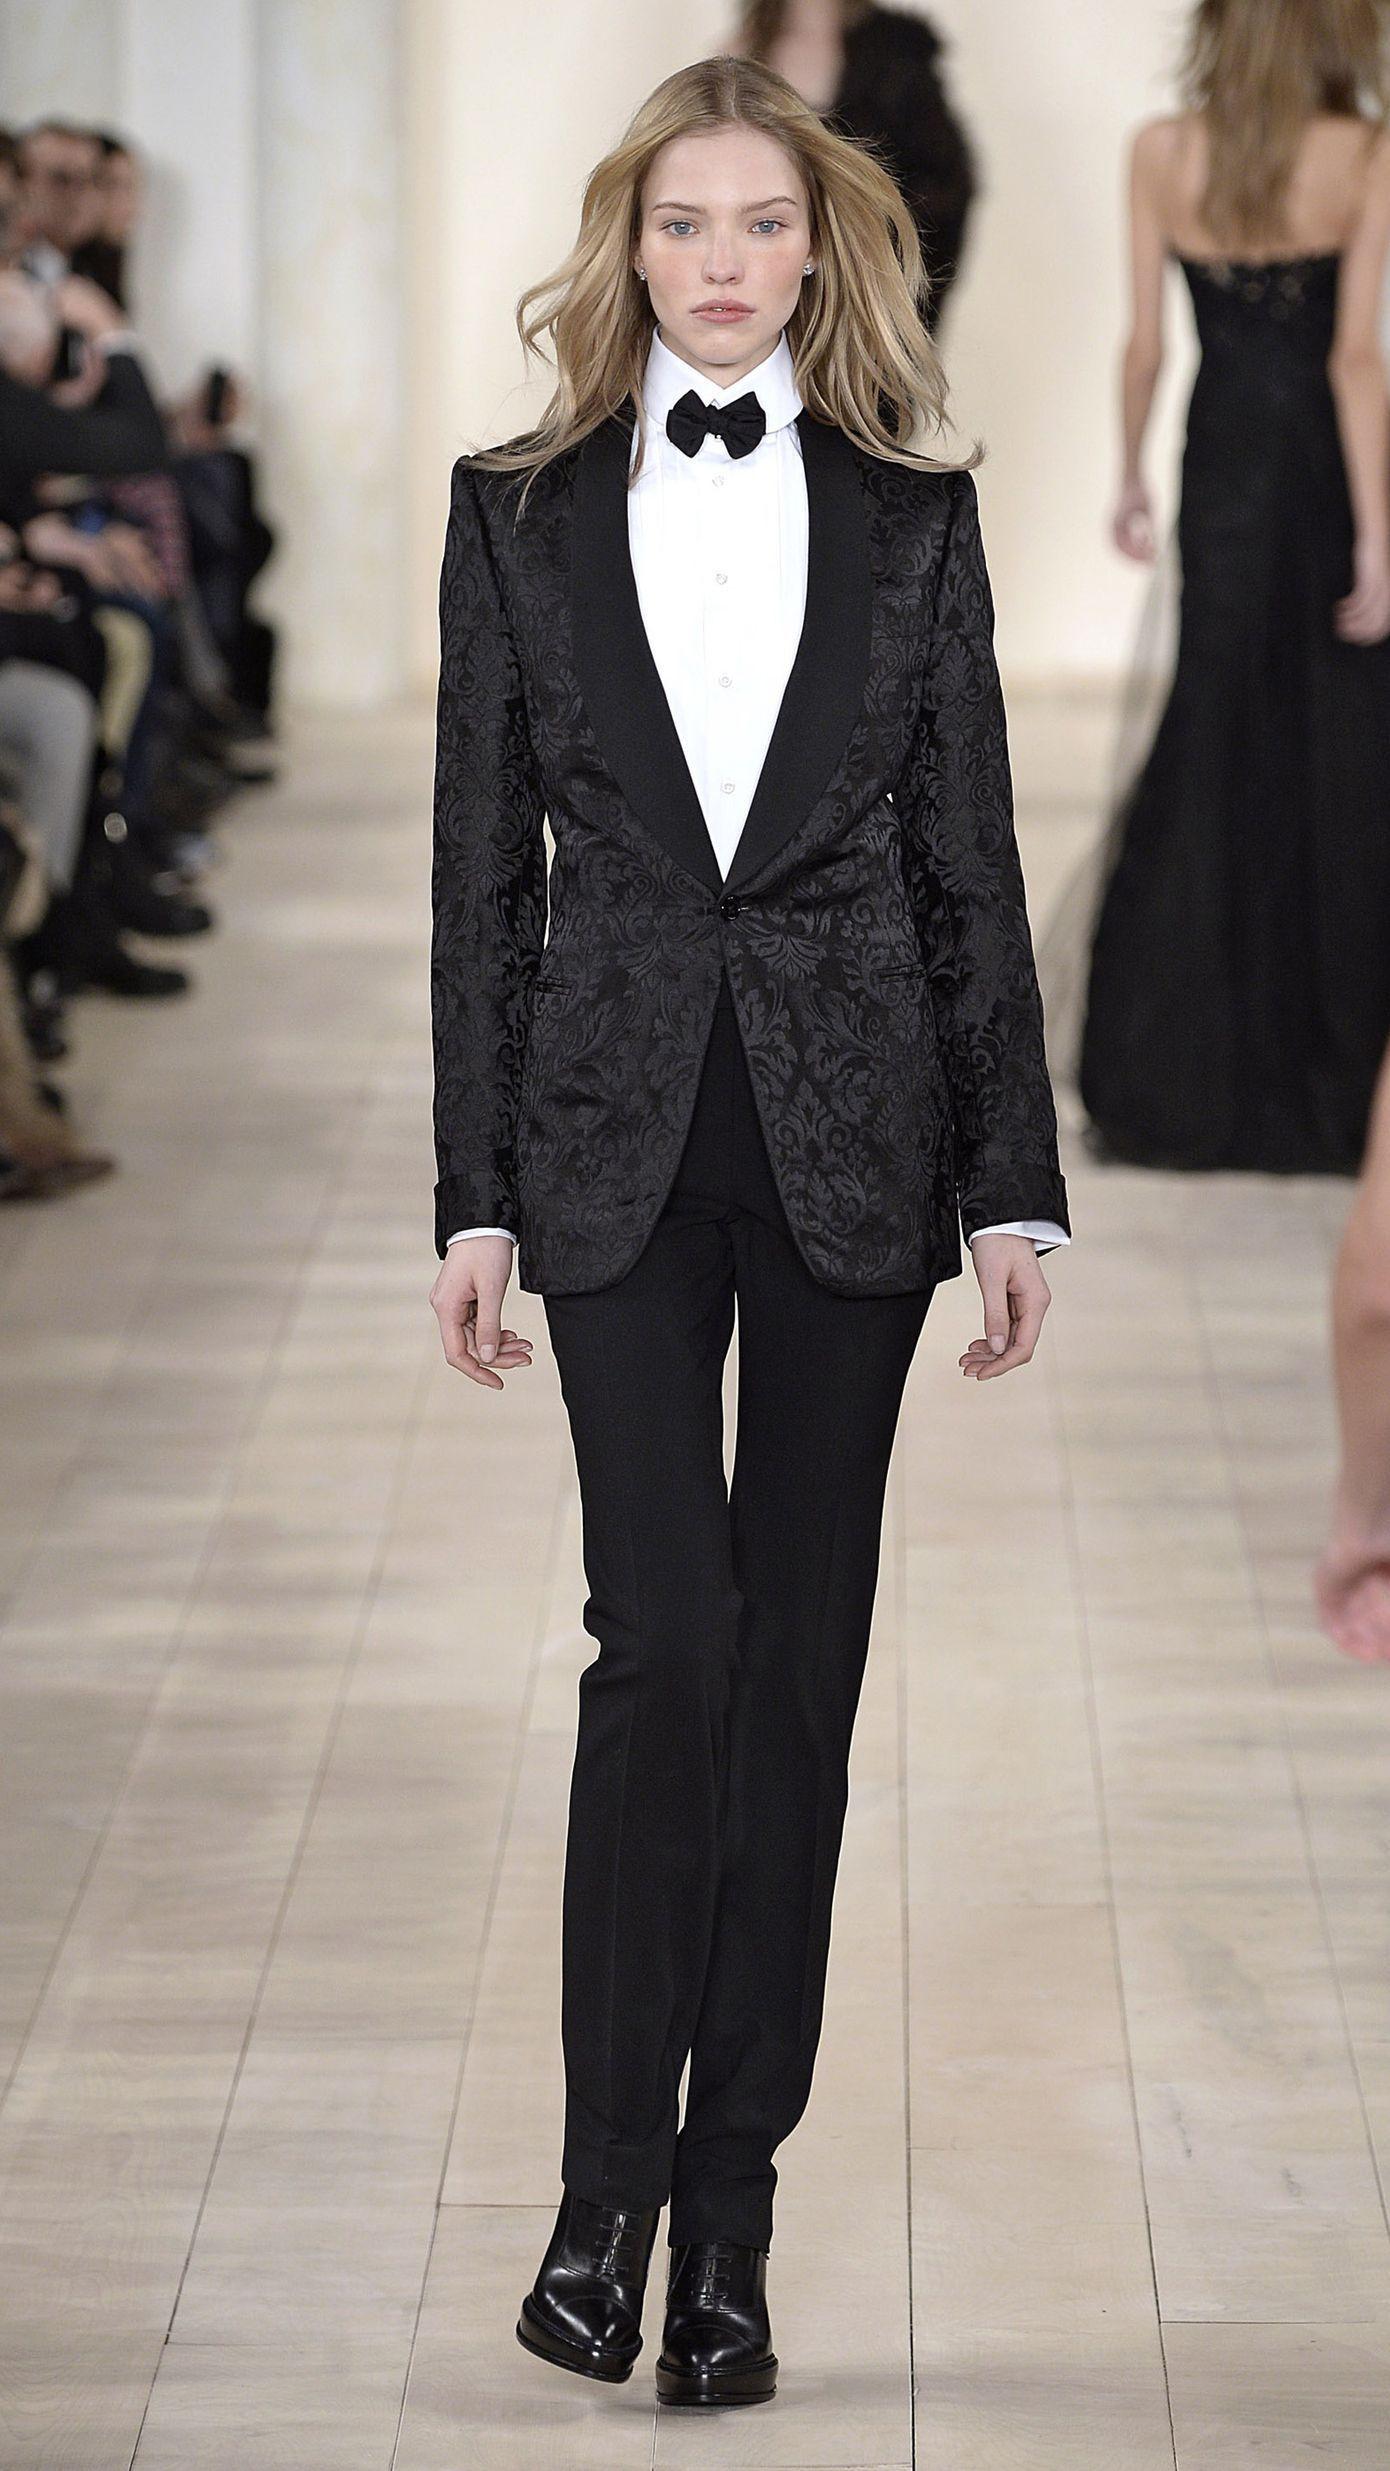 27+ Womens wedding tuxedo uk ideas in 2021